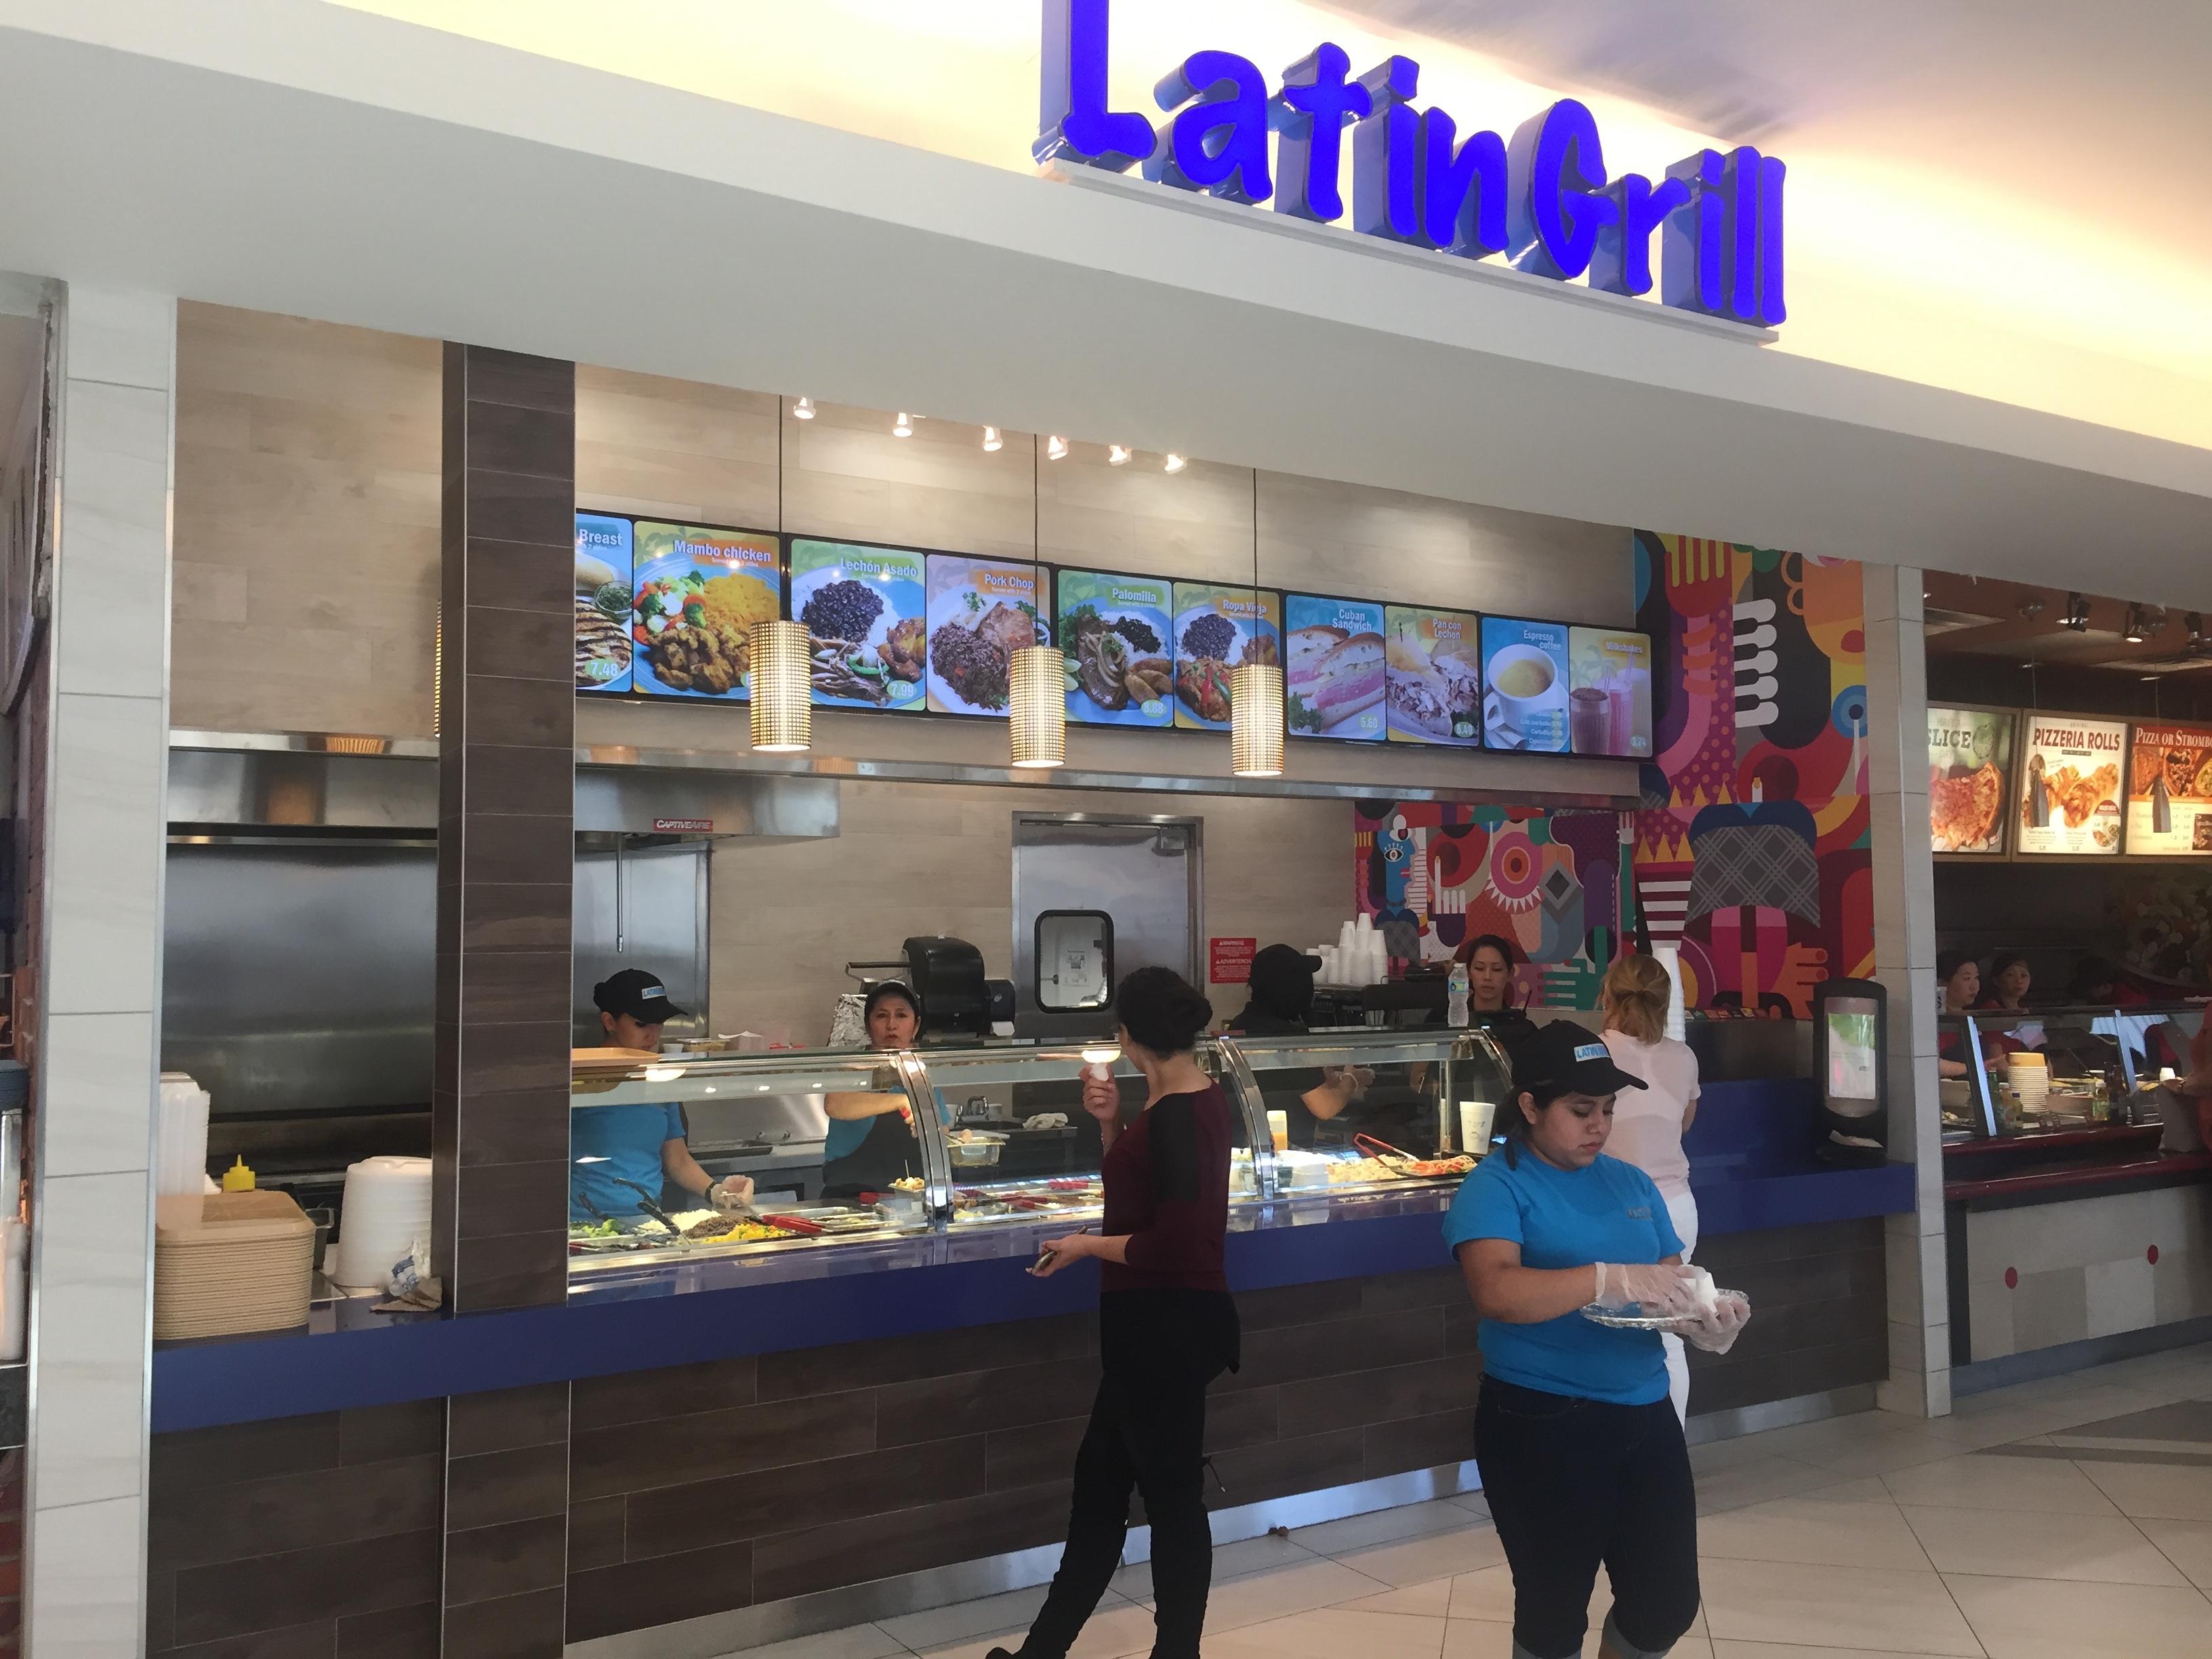 Latin Grill, Dadeland Mall, Miami